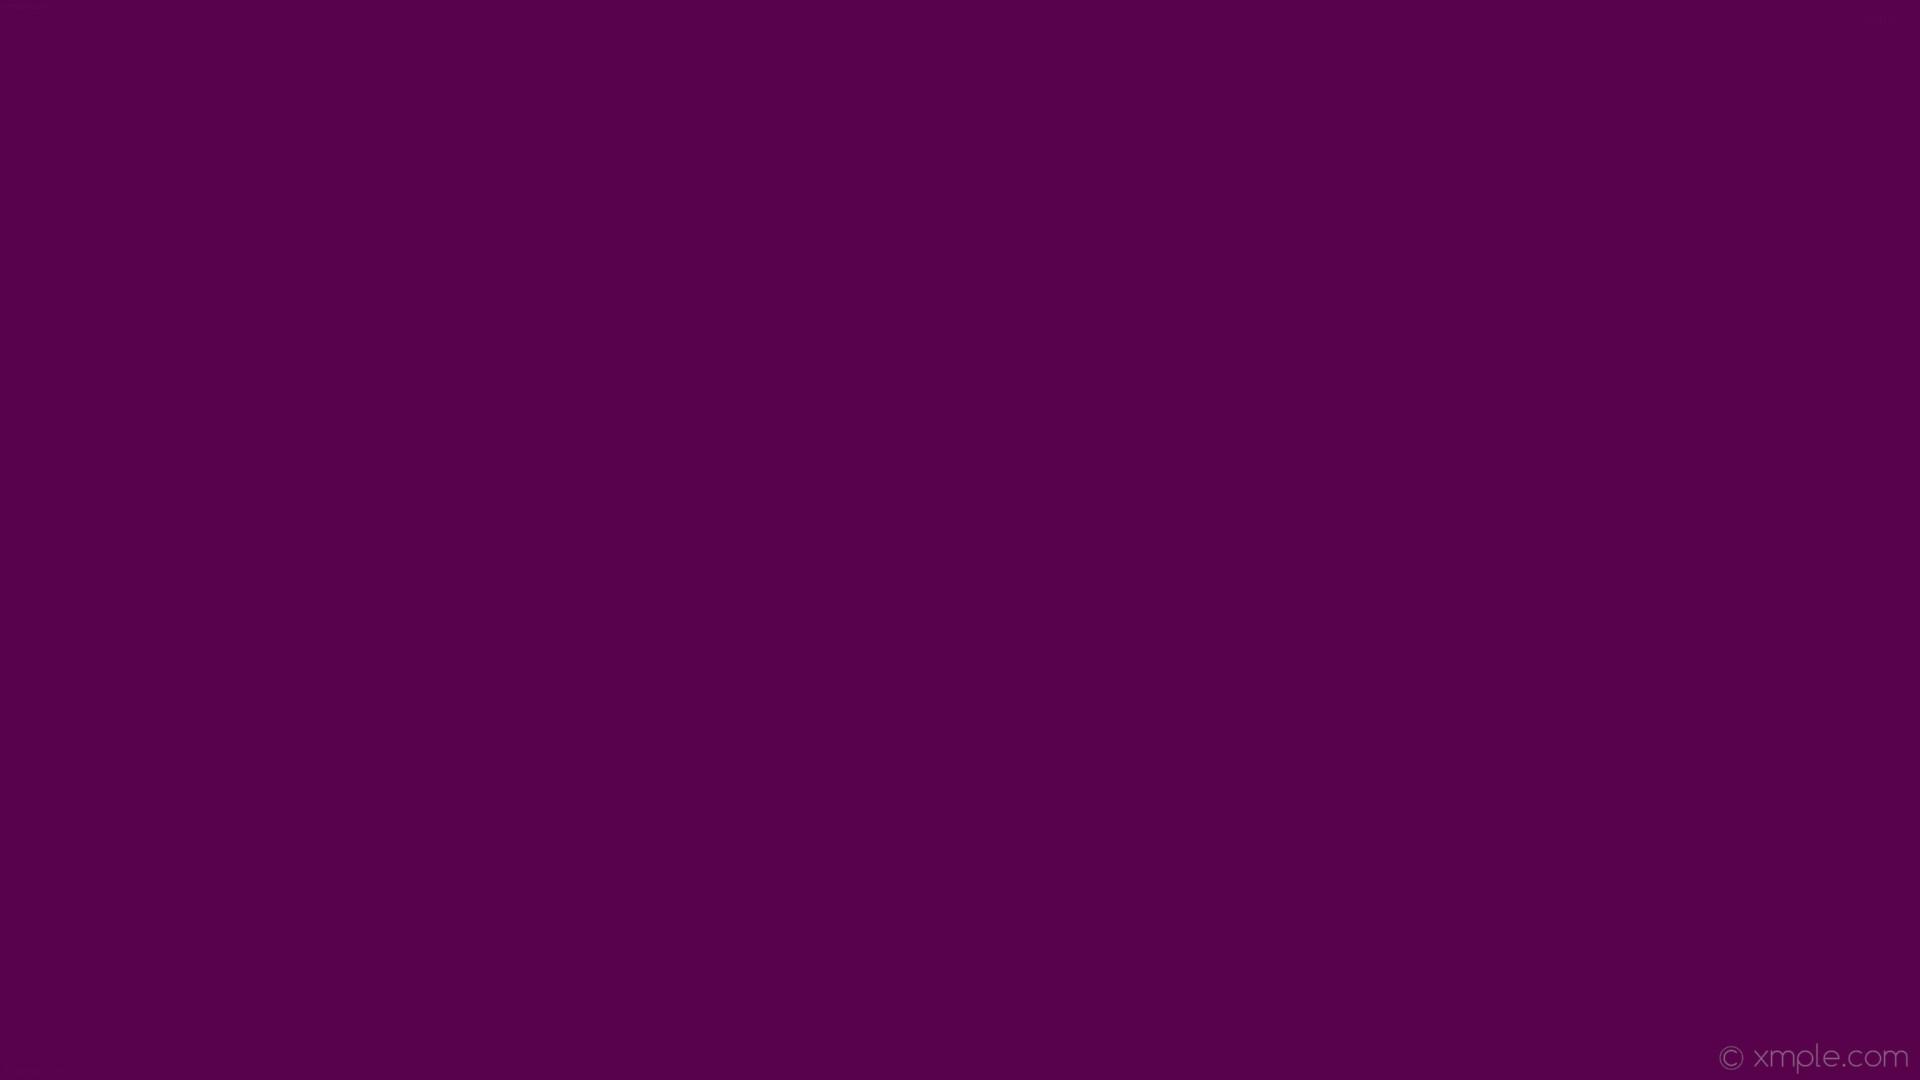 wallpaper magenta solid color plain one colour single dark magenta #58024b